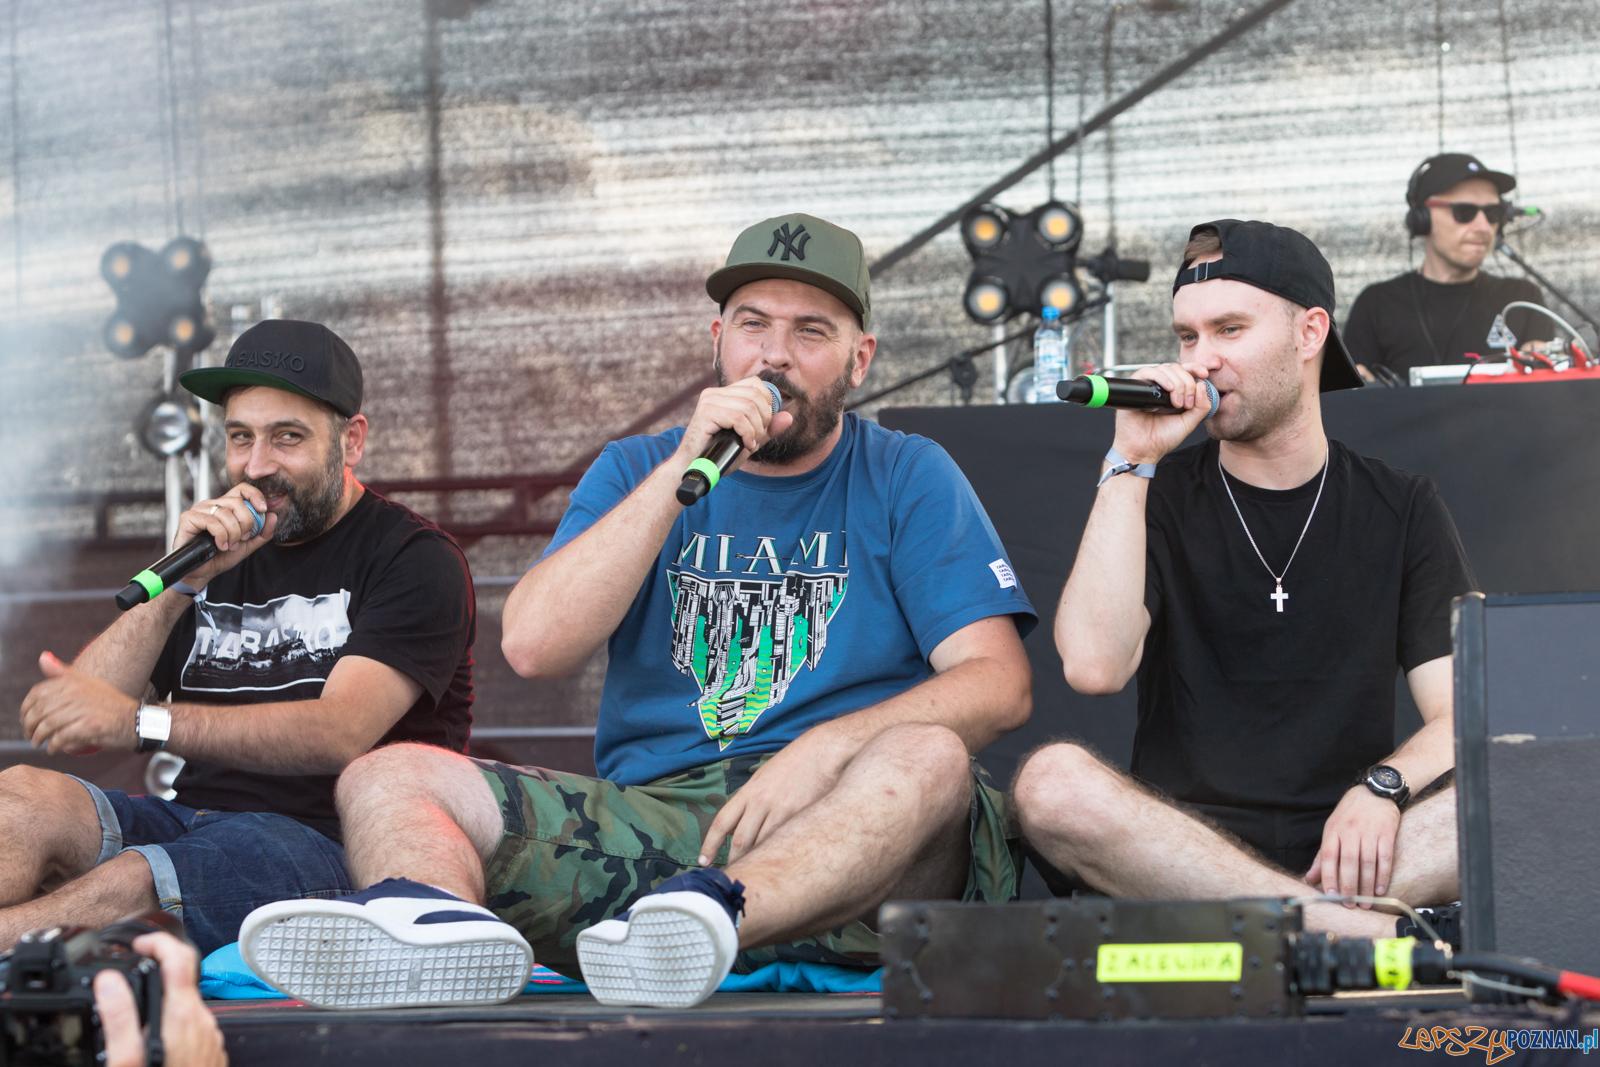 Edison Festival - Taste The Music - O.S.T.R.  Foto: lepszyPOZNAN.pl/Piotr Rychter